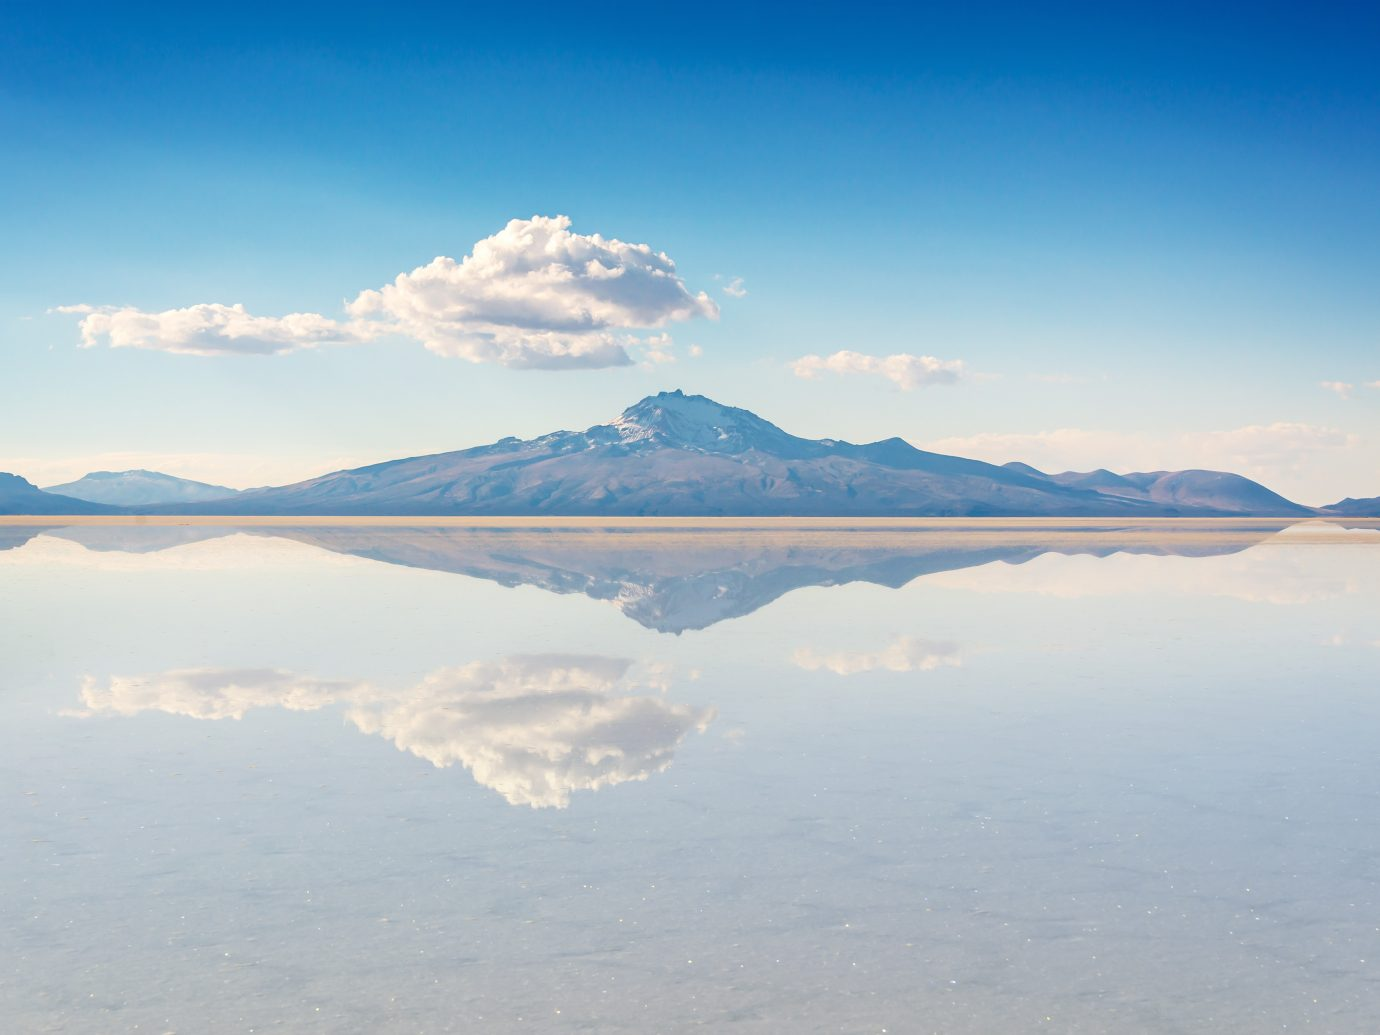 reflection of mountain in Salar de Uyuni (Uyuni salt flats), Potosi, Bolivia, South America